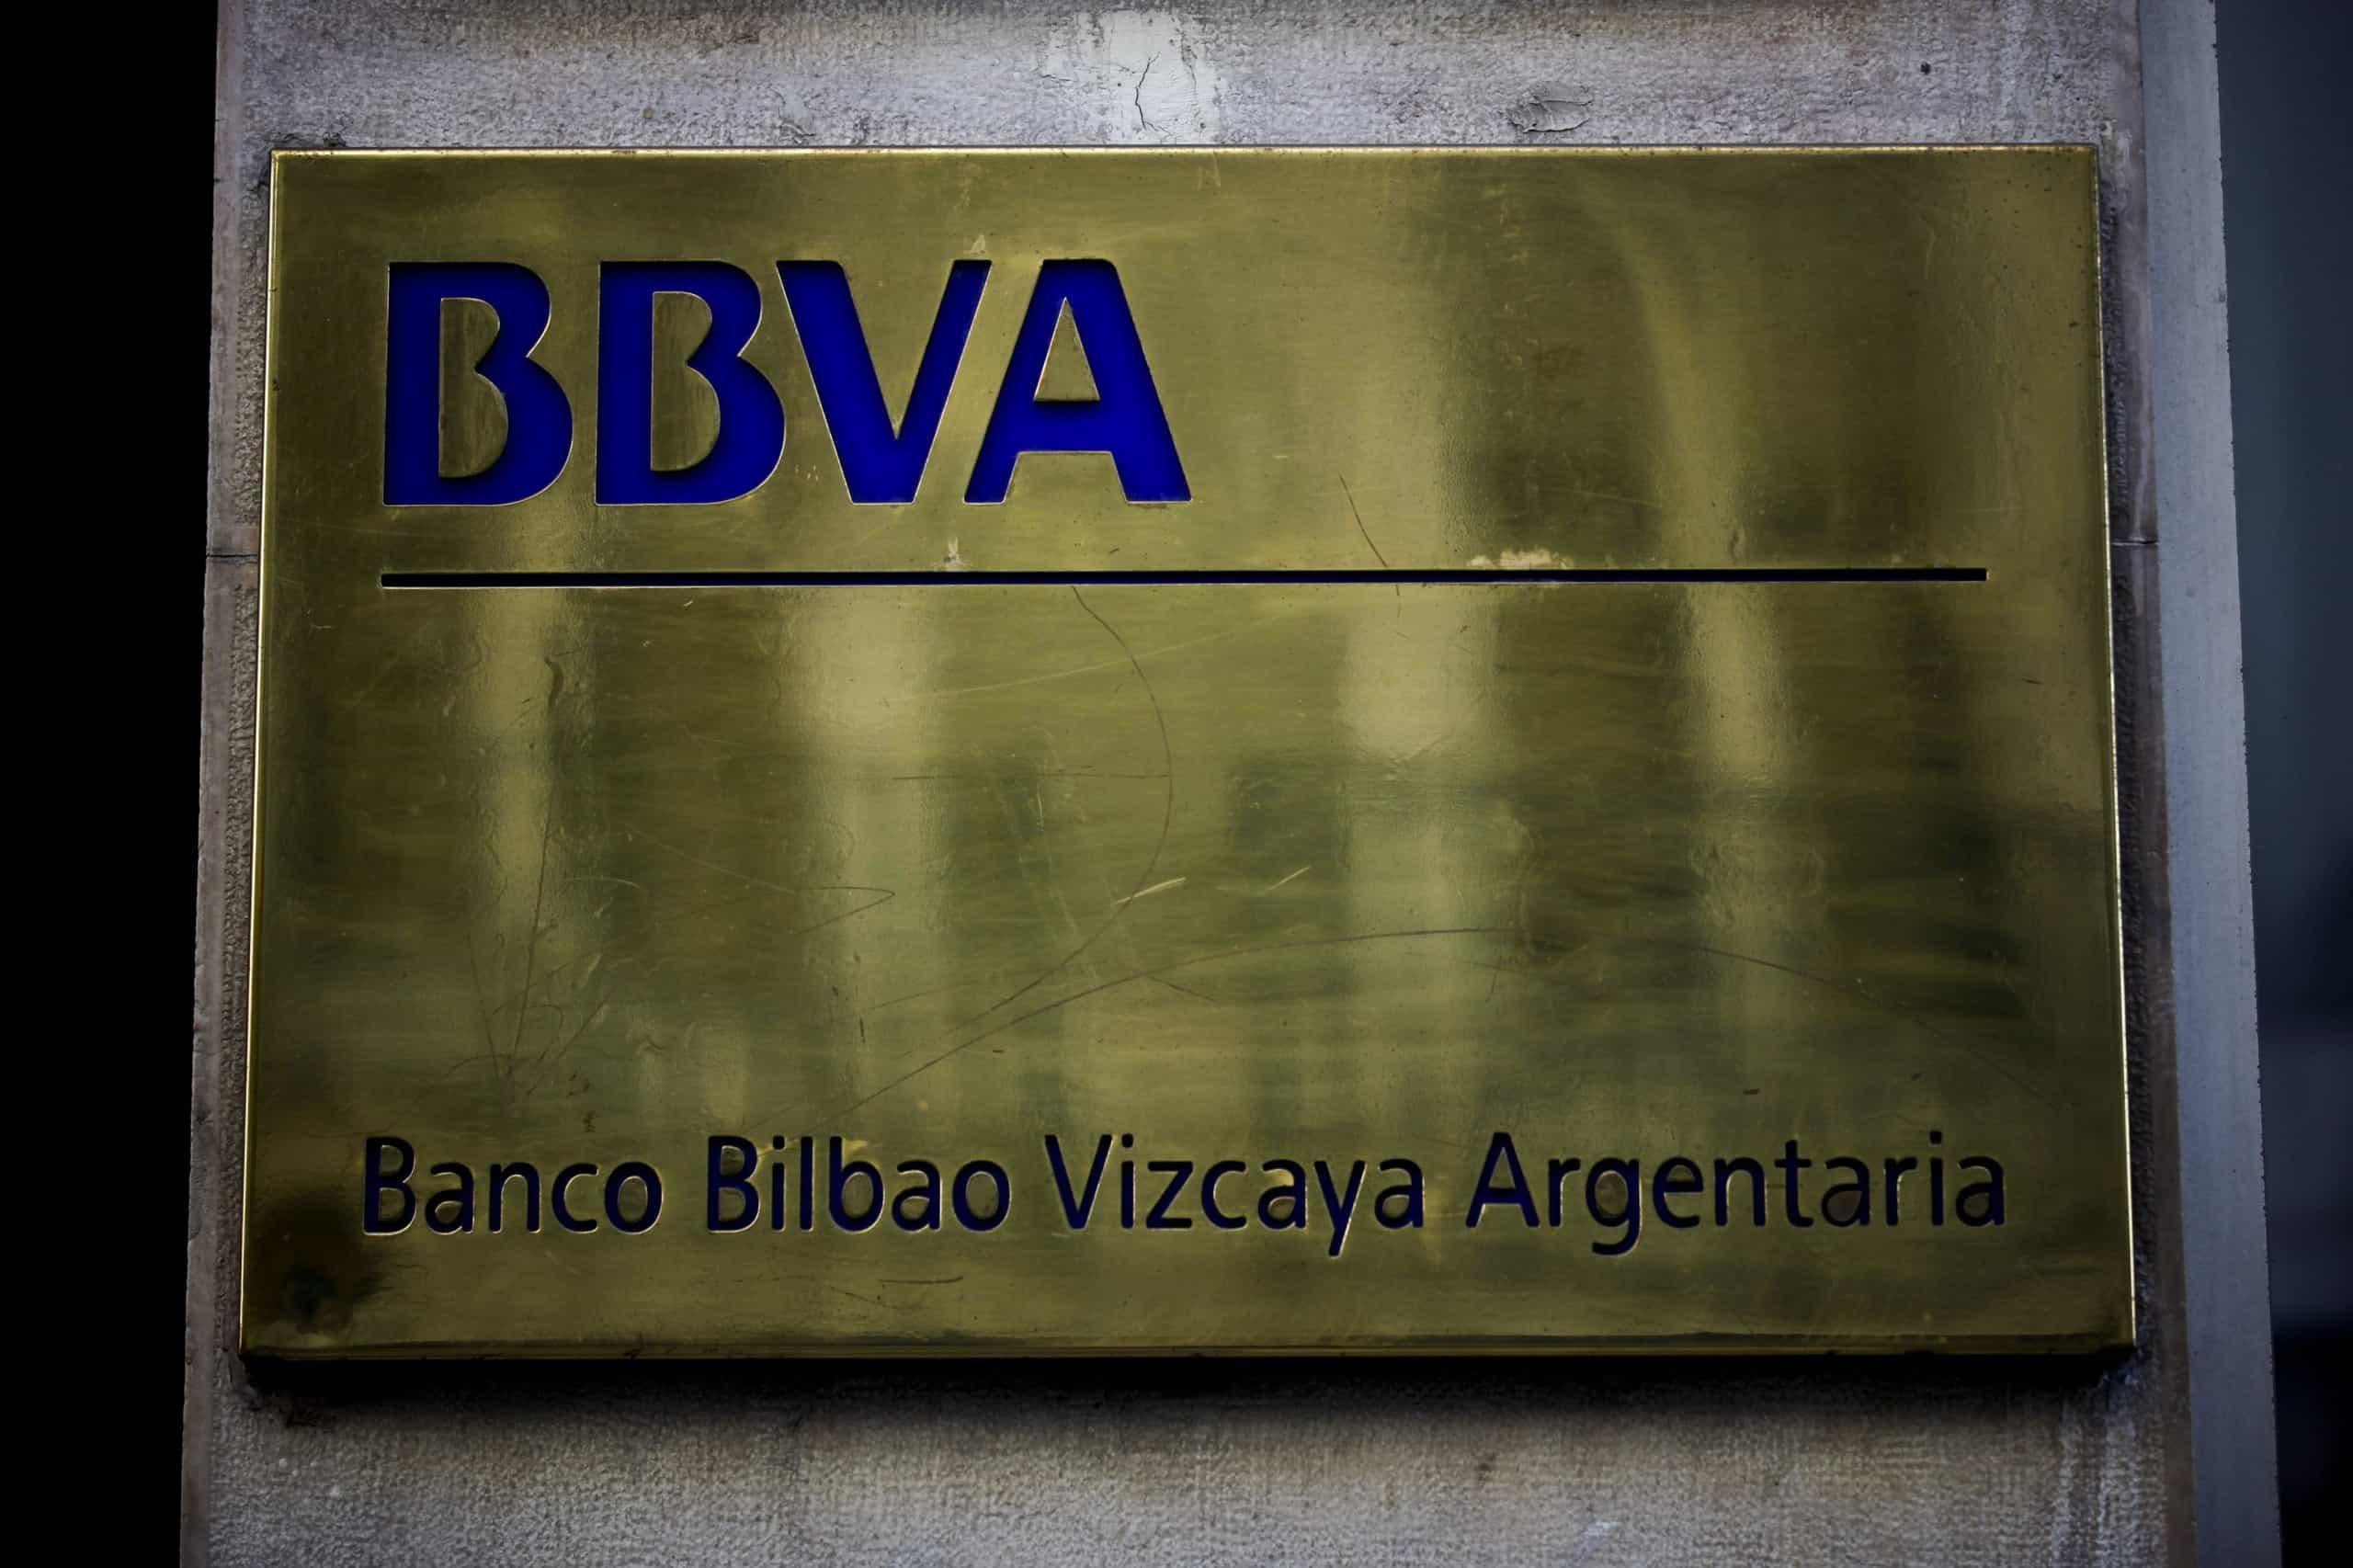 Banco BBVA passa hoje a sucursal em Portugal